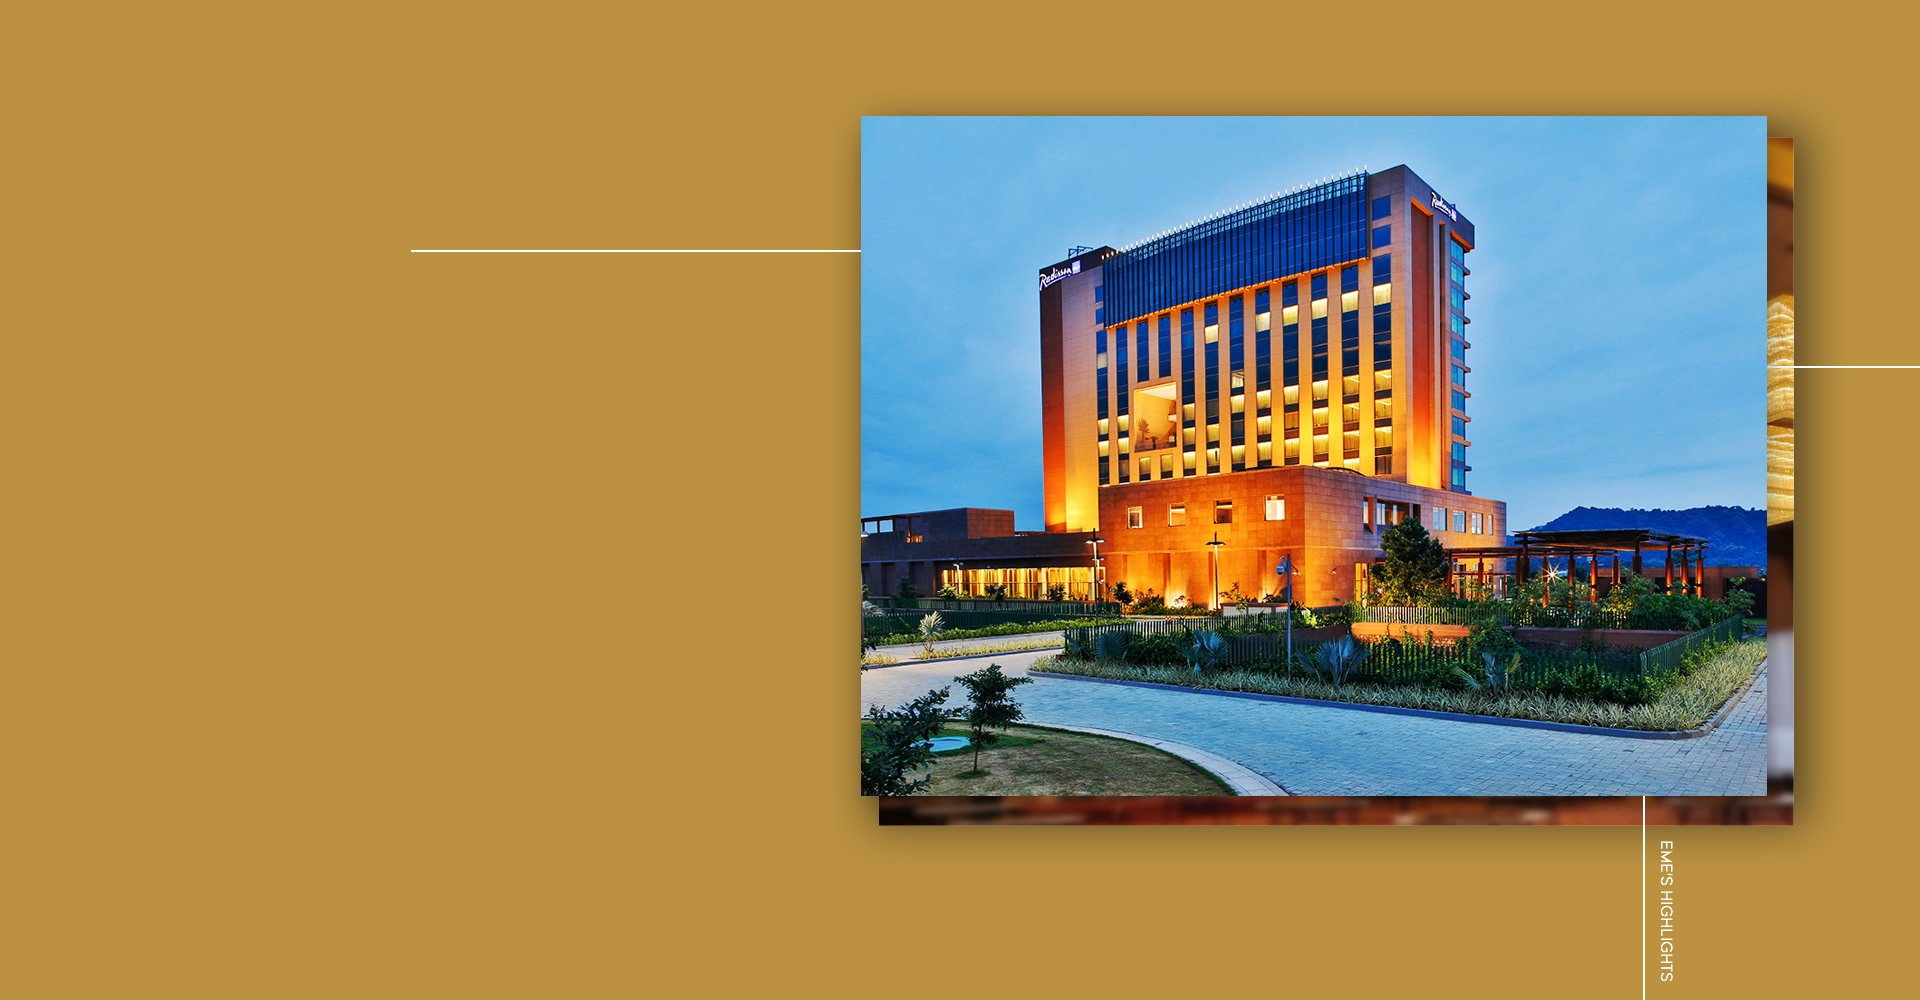 RADISSON BLU GUWAHATI HOTEL</br>INDIA